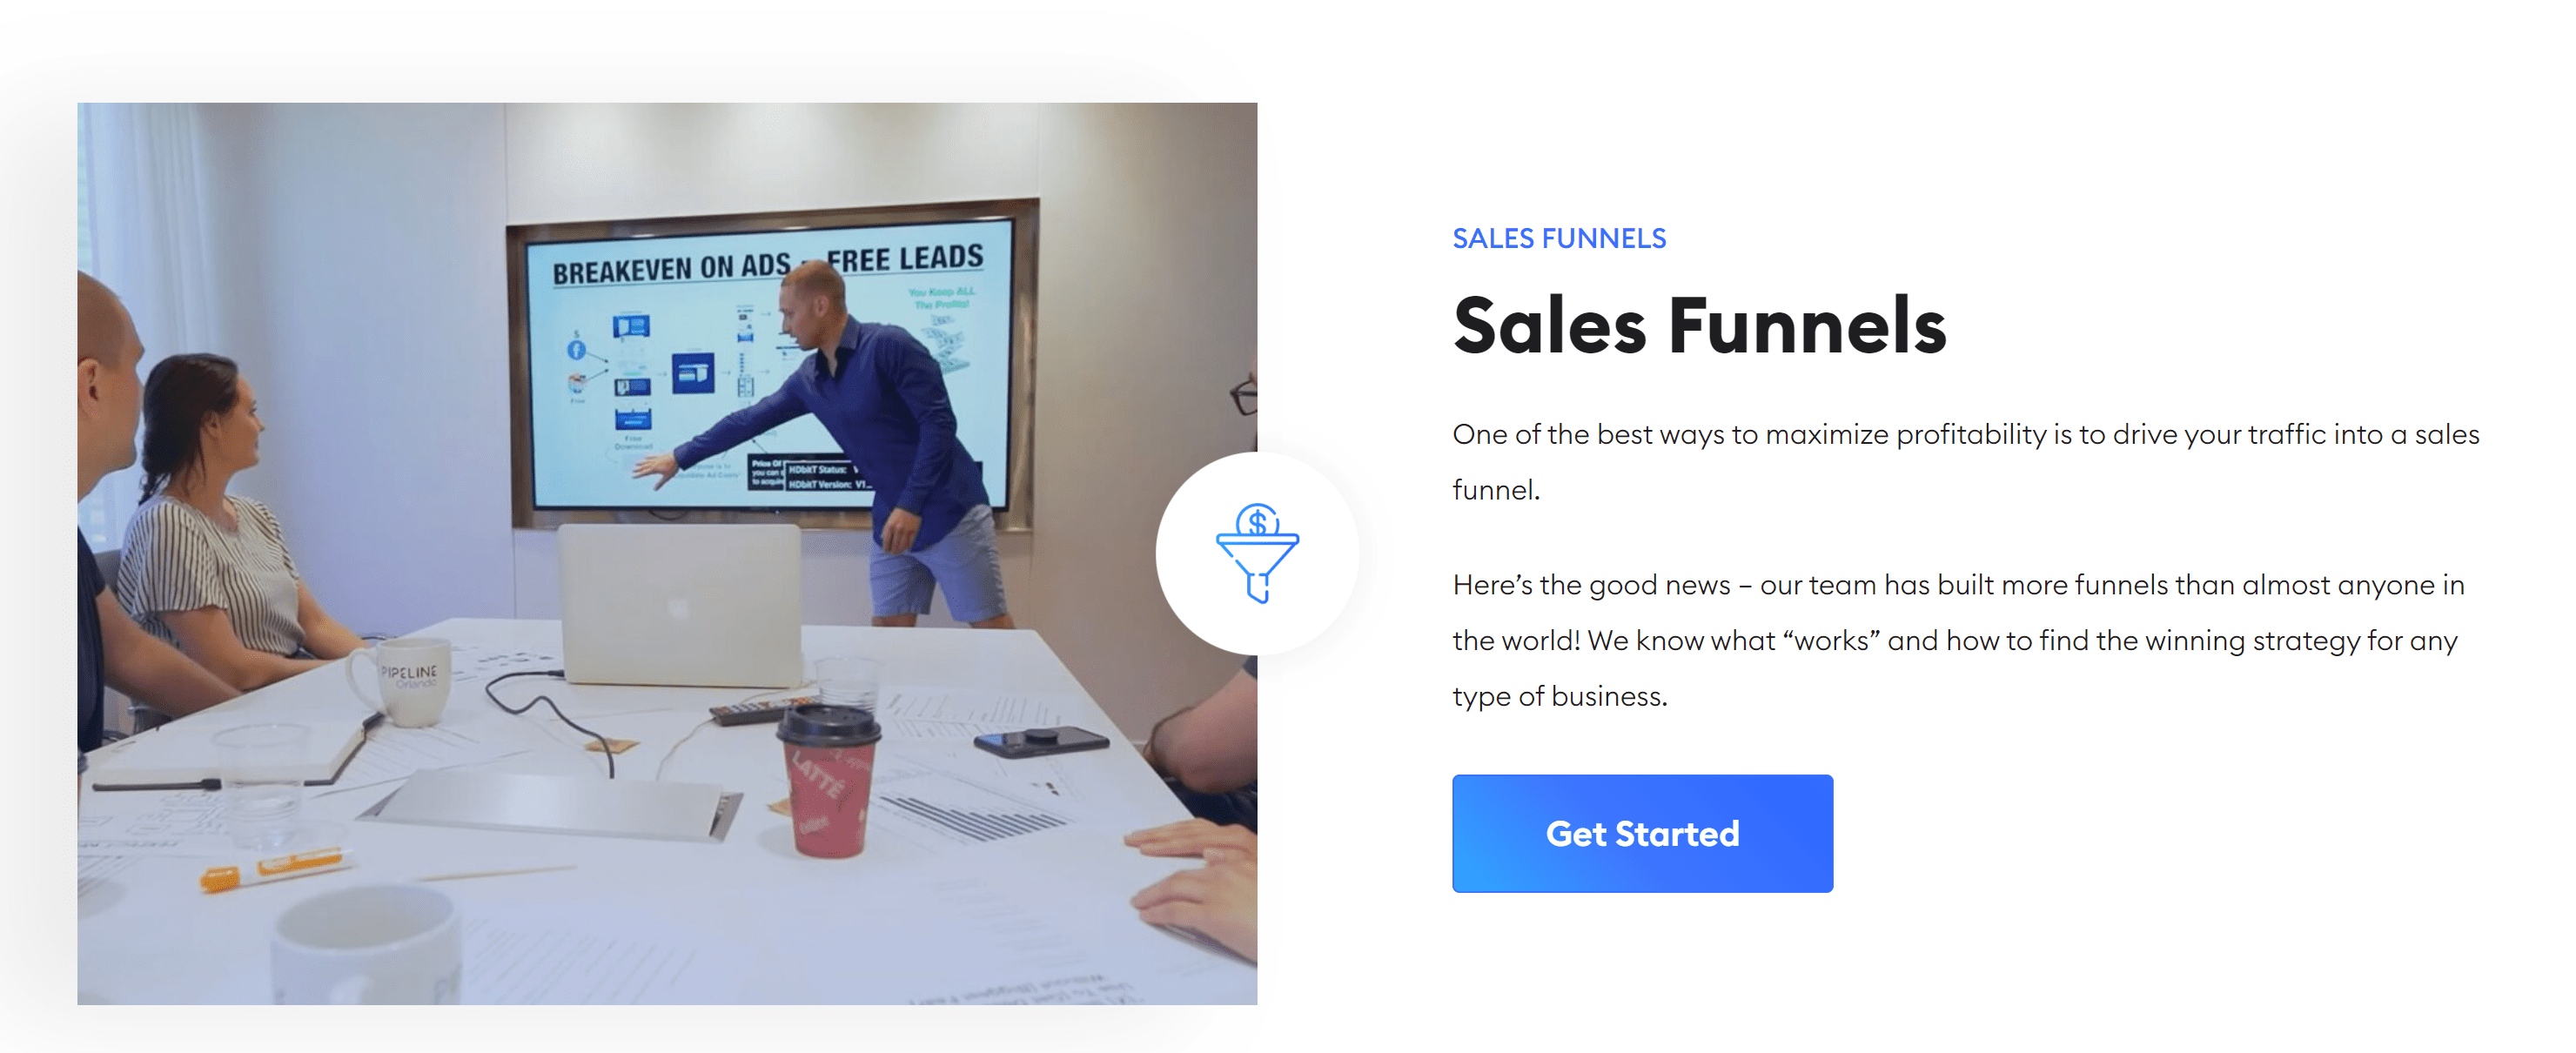 sales funnel- blake nubar review